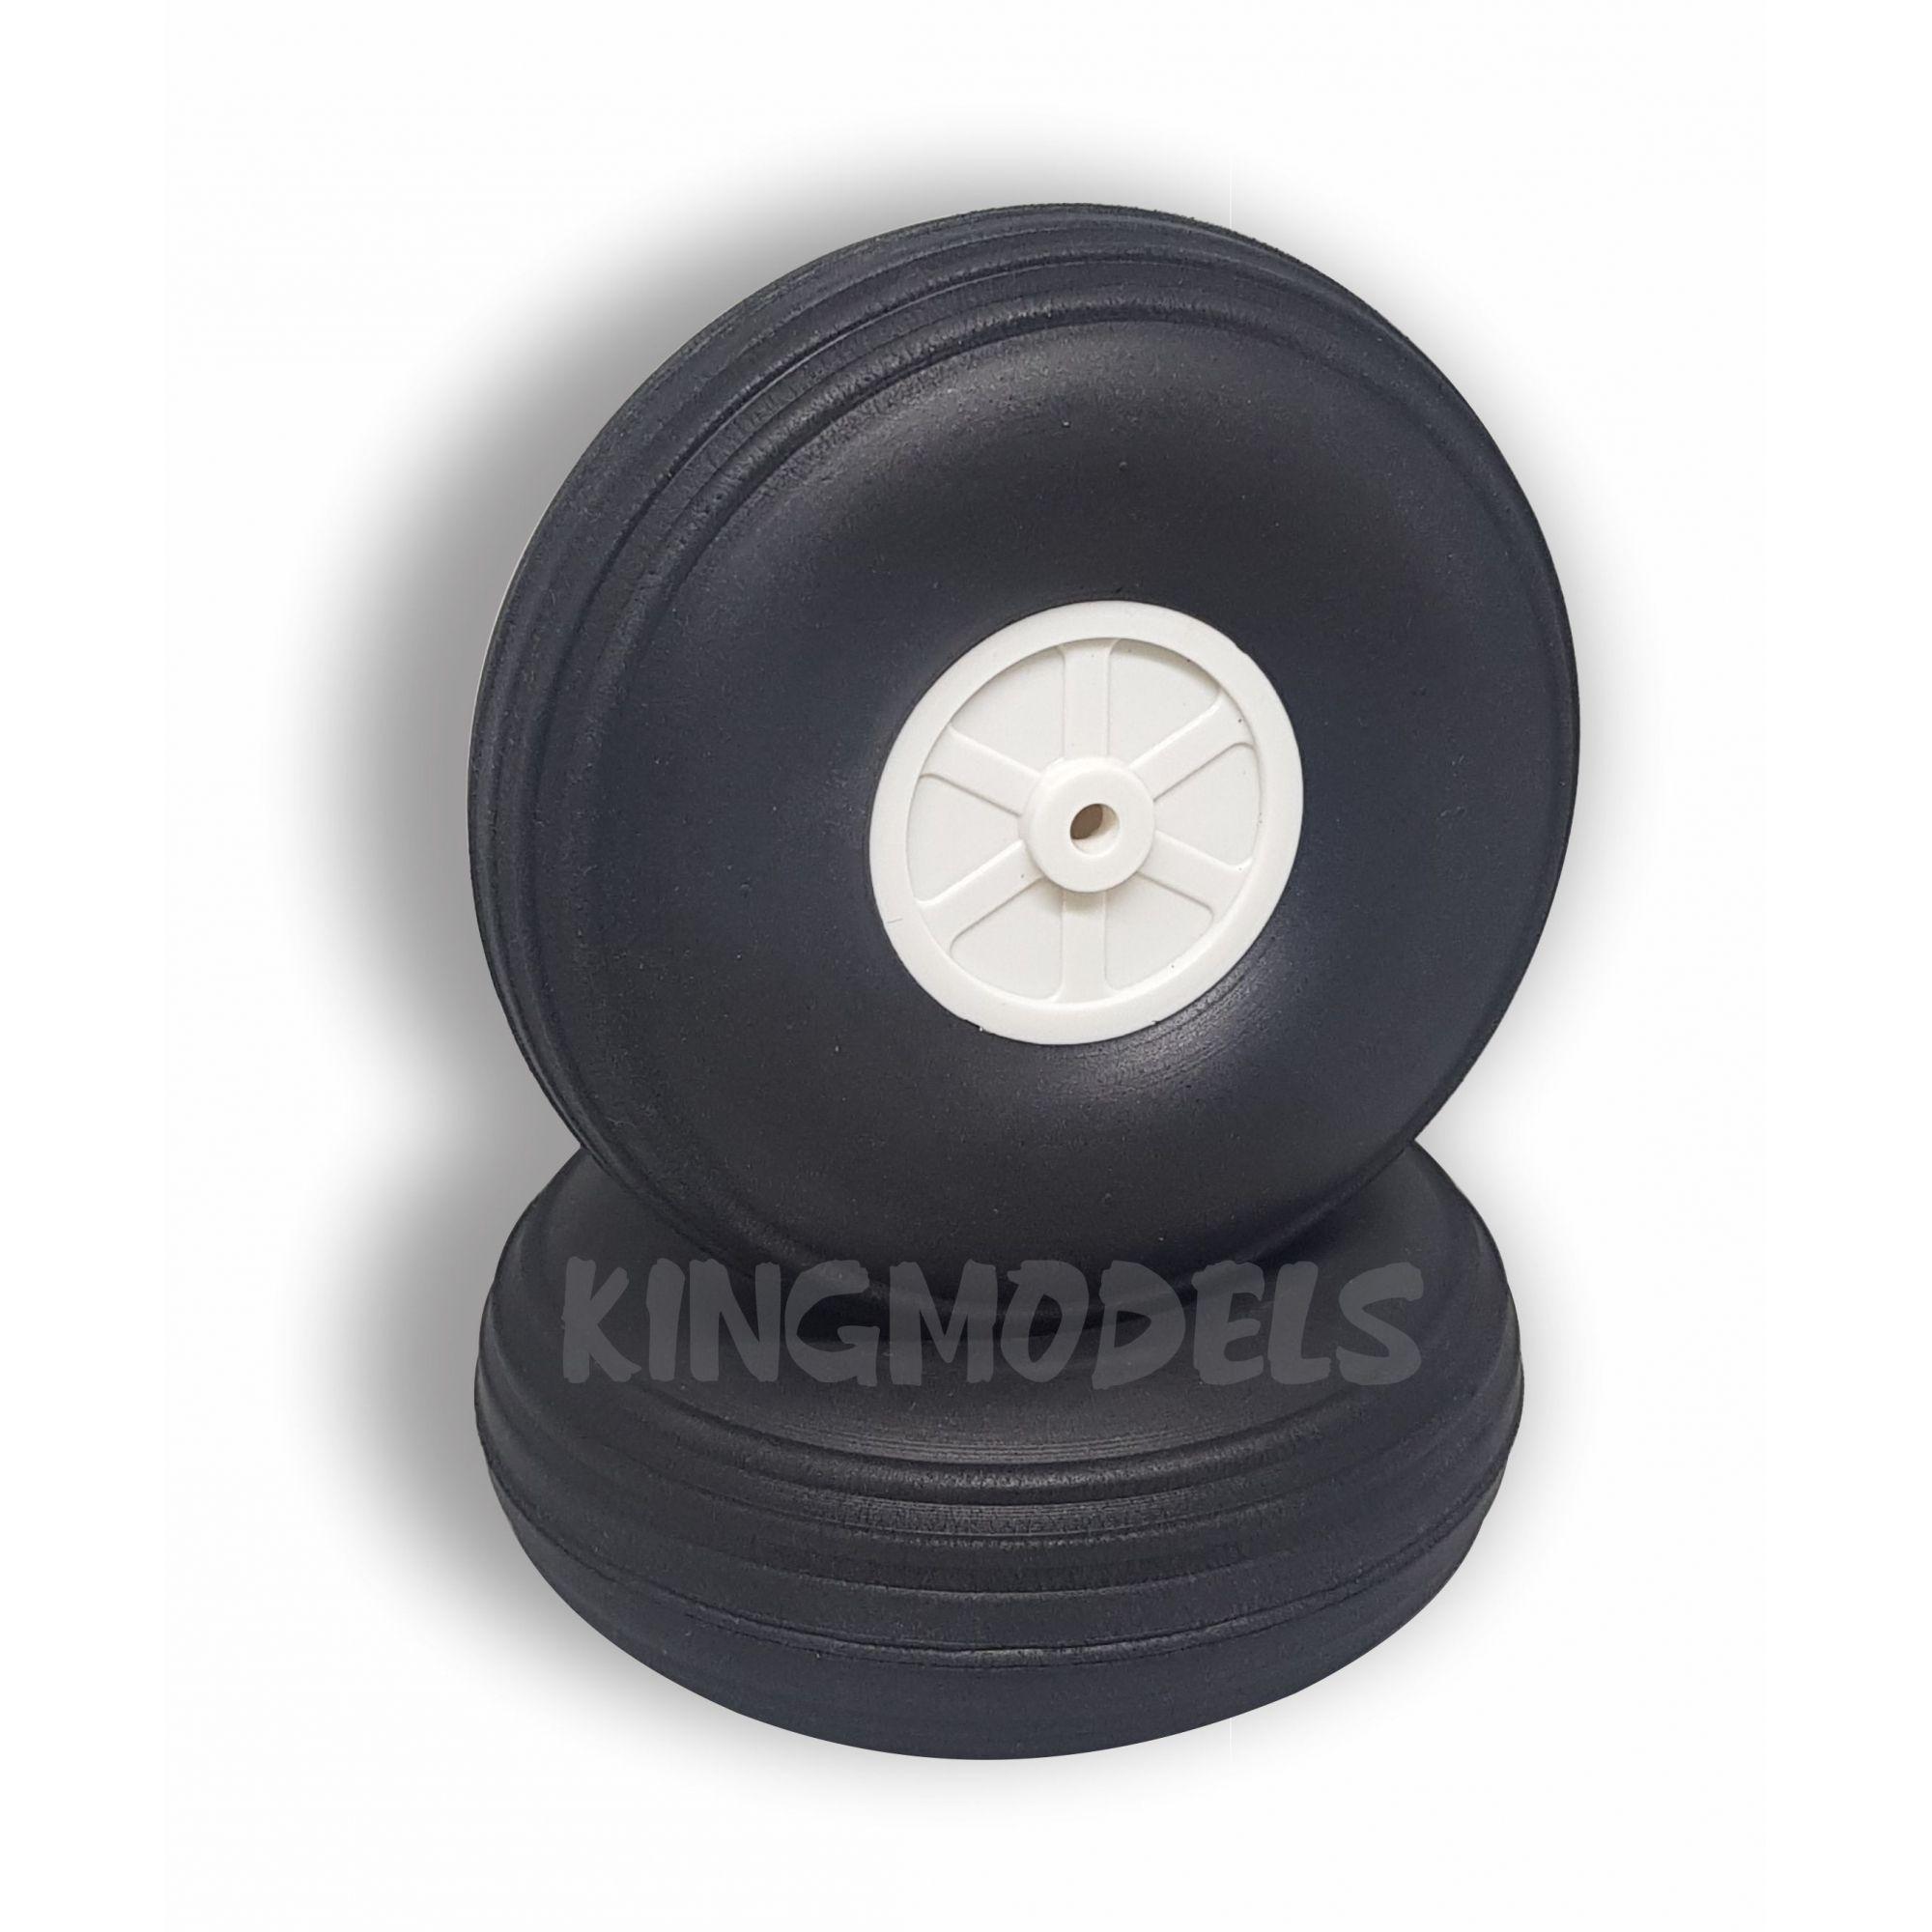 Roda De Borracha Extra-leve E Cubo Nylon-32mm-Aerodinâmica (2pçs)  - King Models